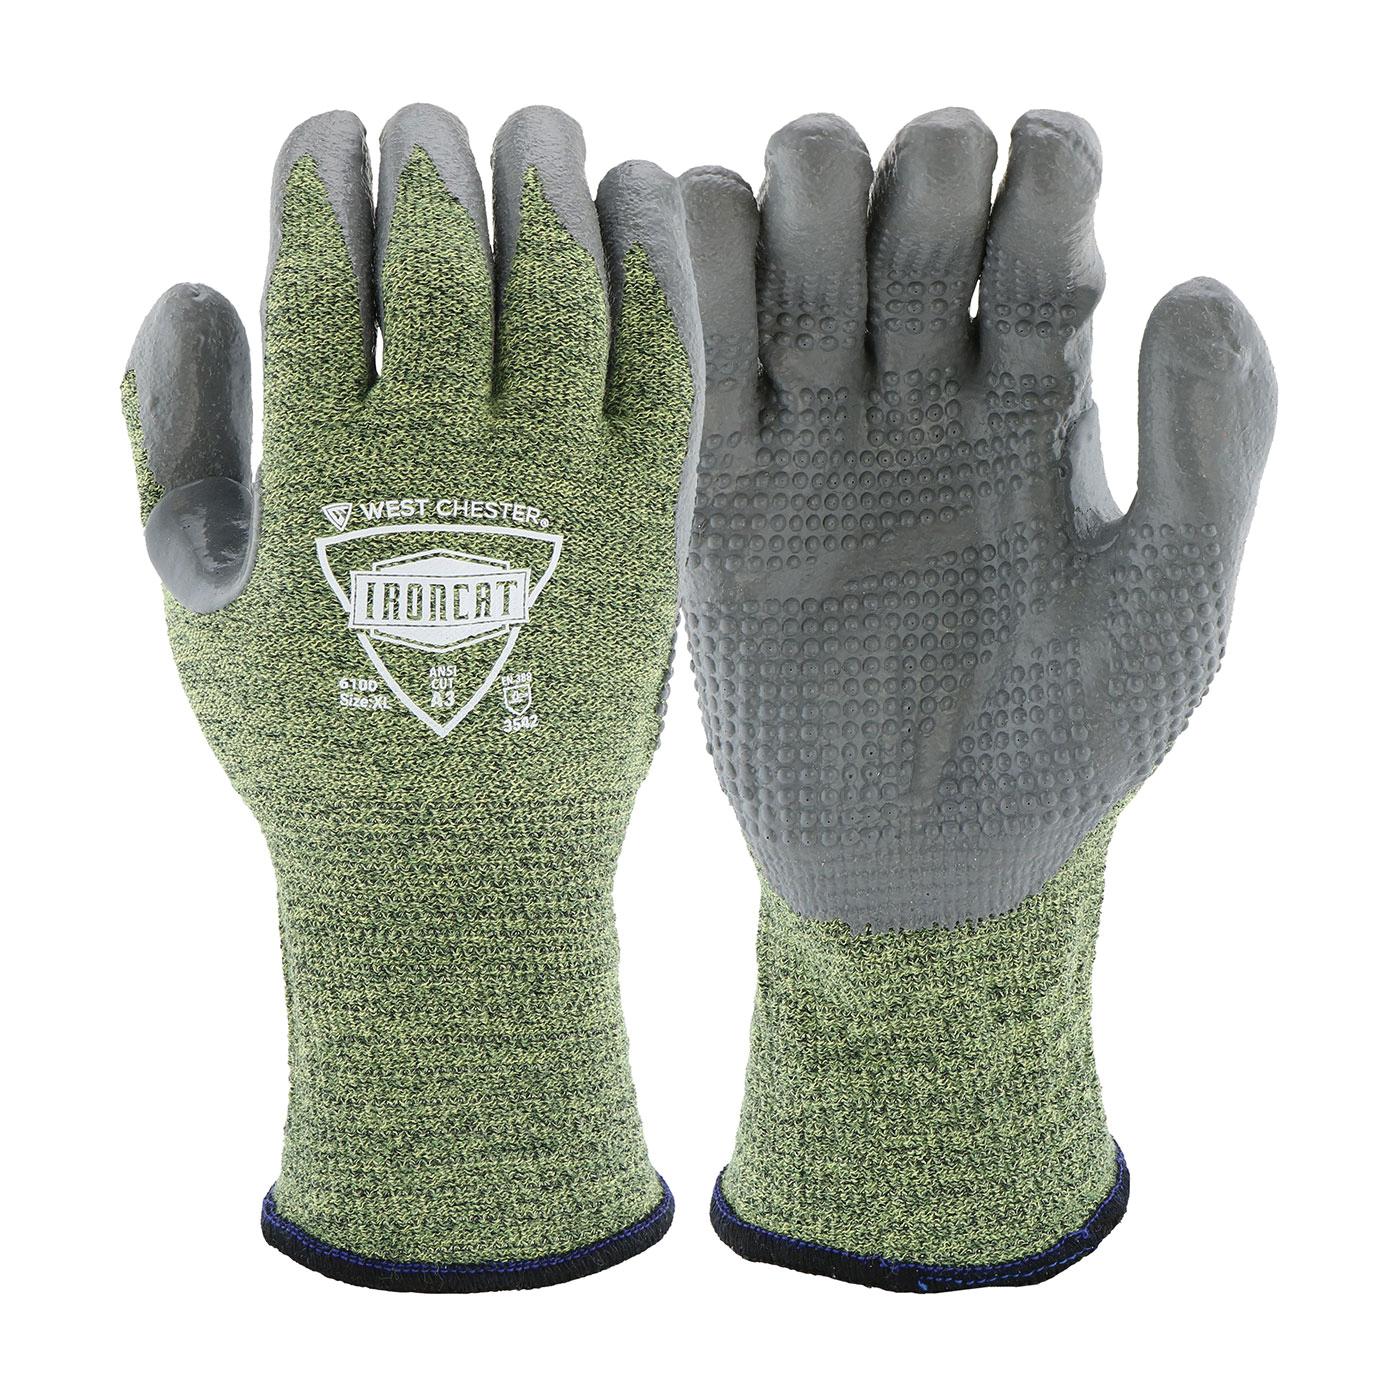 Ironcat® Metal Tamer™ 6100/2XL TIG Welding Gloves, 2XL, Silicone, Gray/Green, Rib Knit Cuff, 12 in L